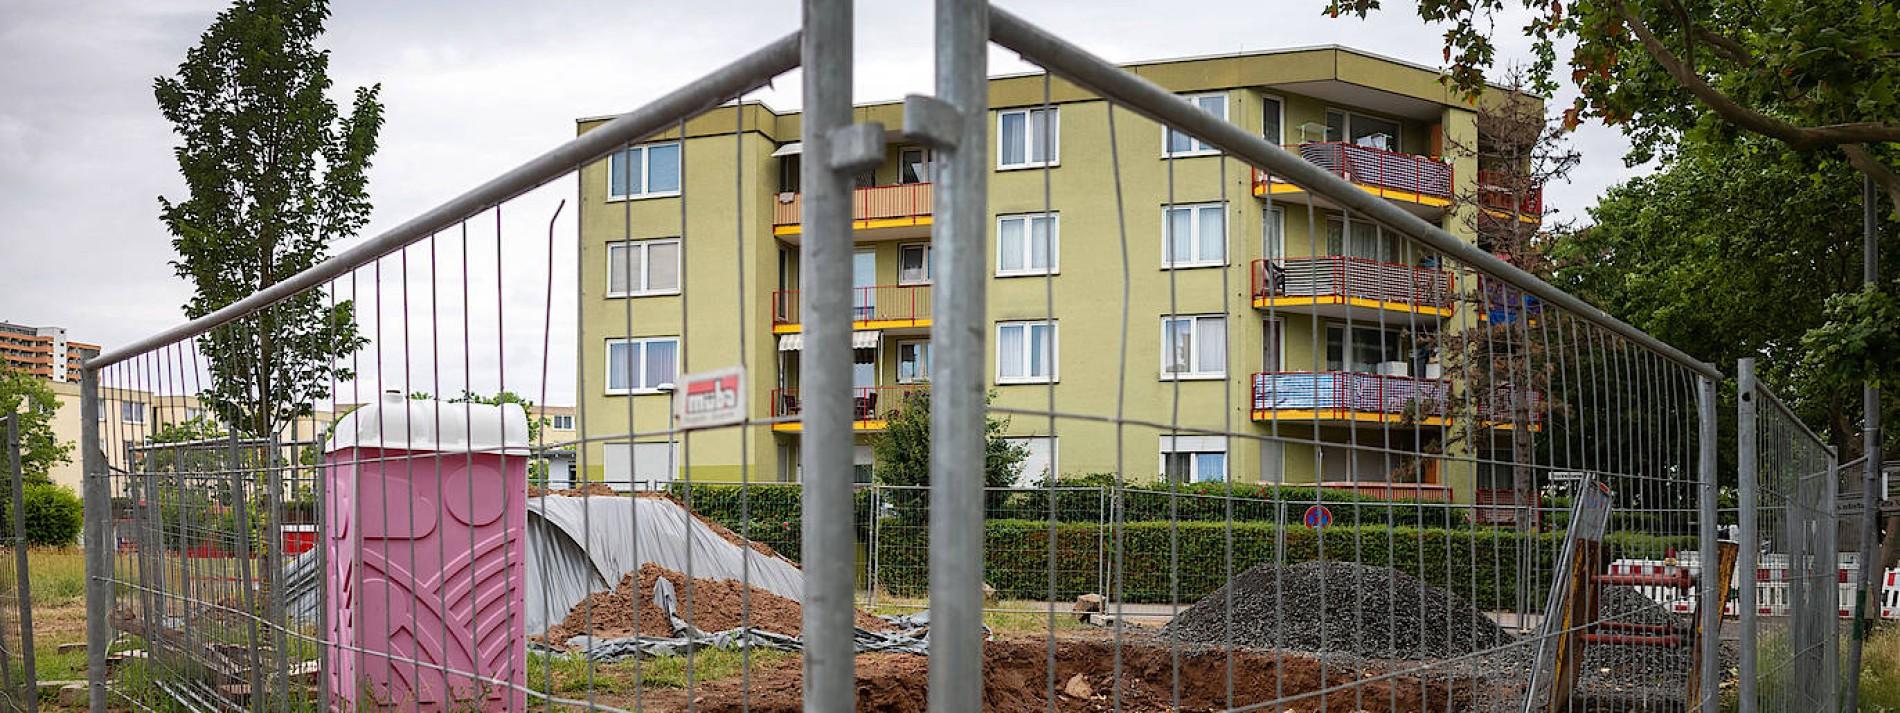 Anklage gegen Dietzenbacher Angreifer